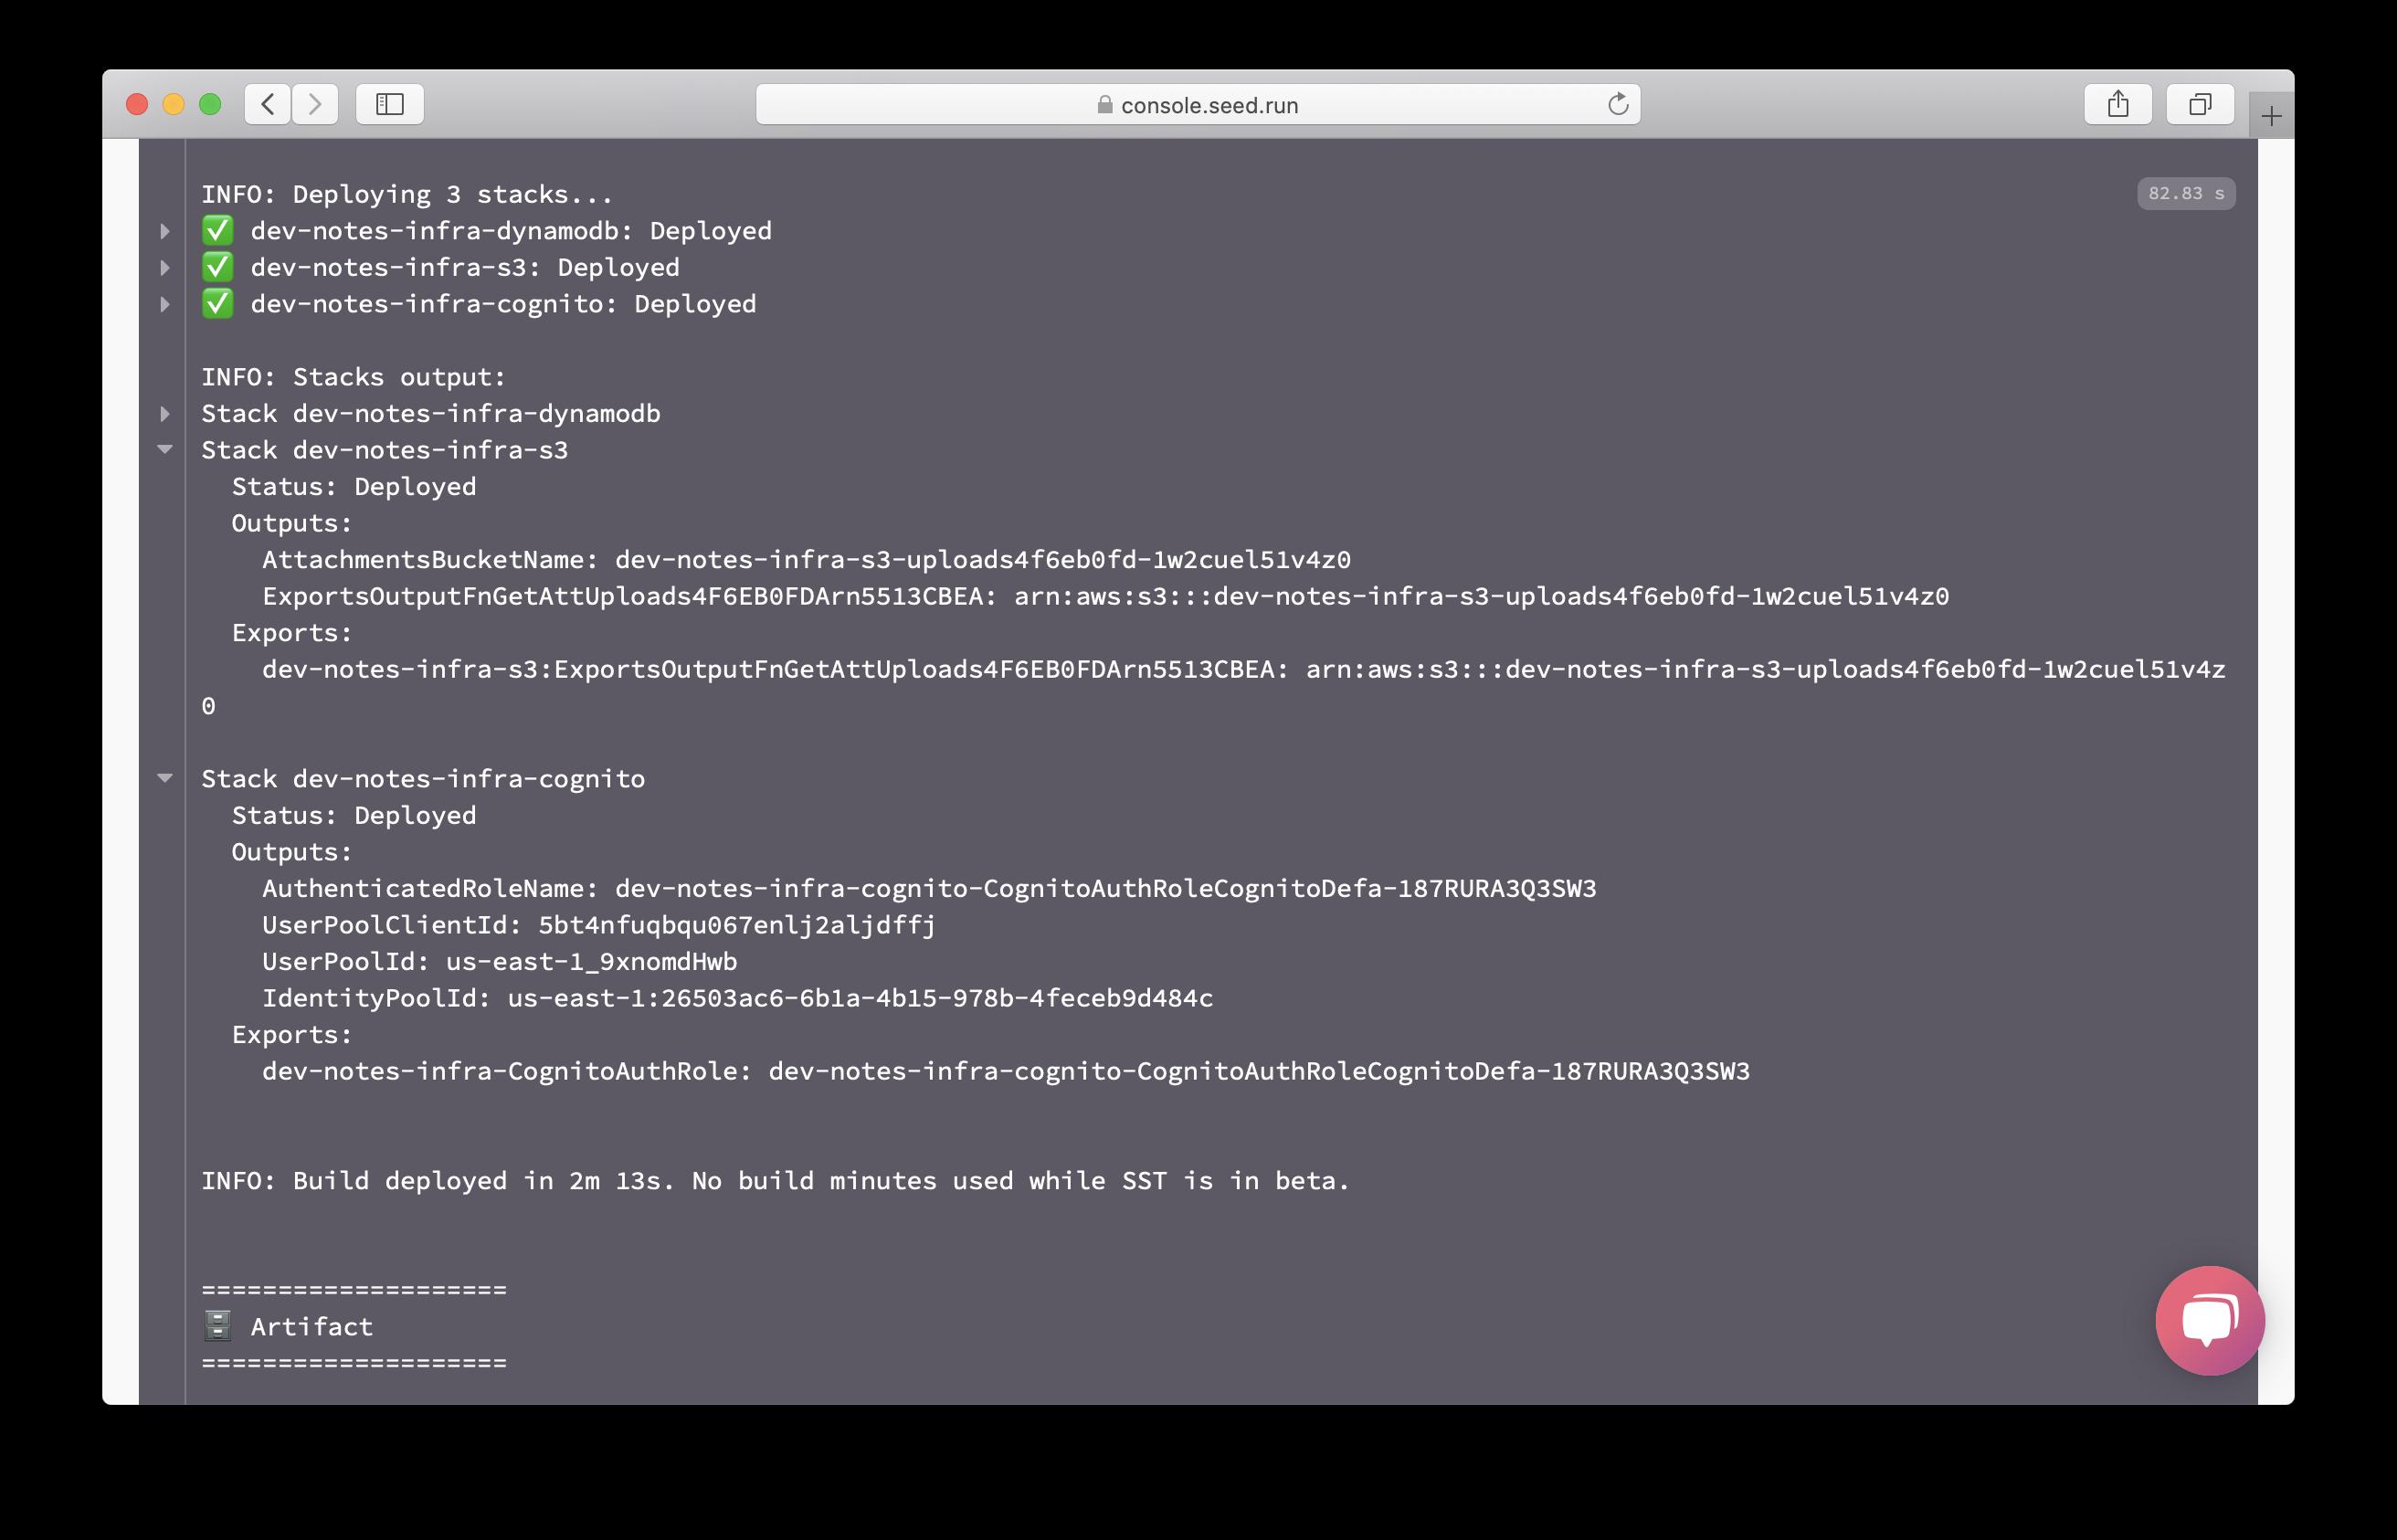 Dev build infrastructure output screenshot